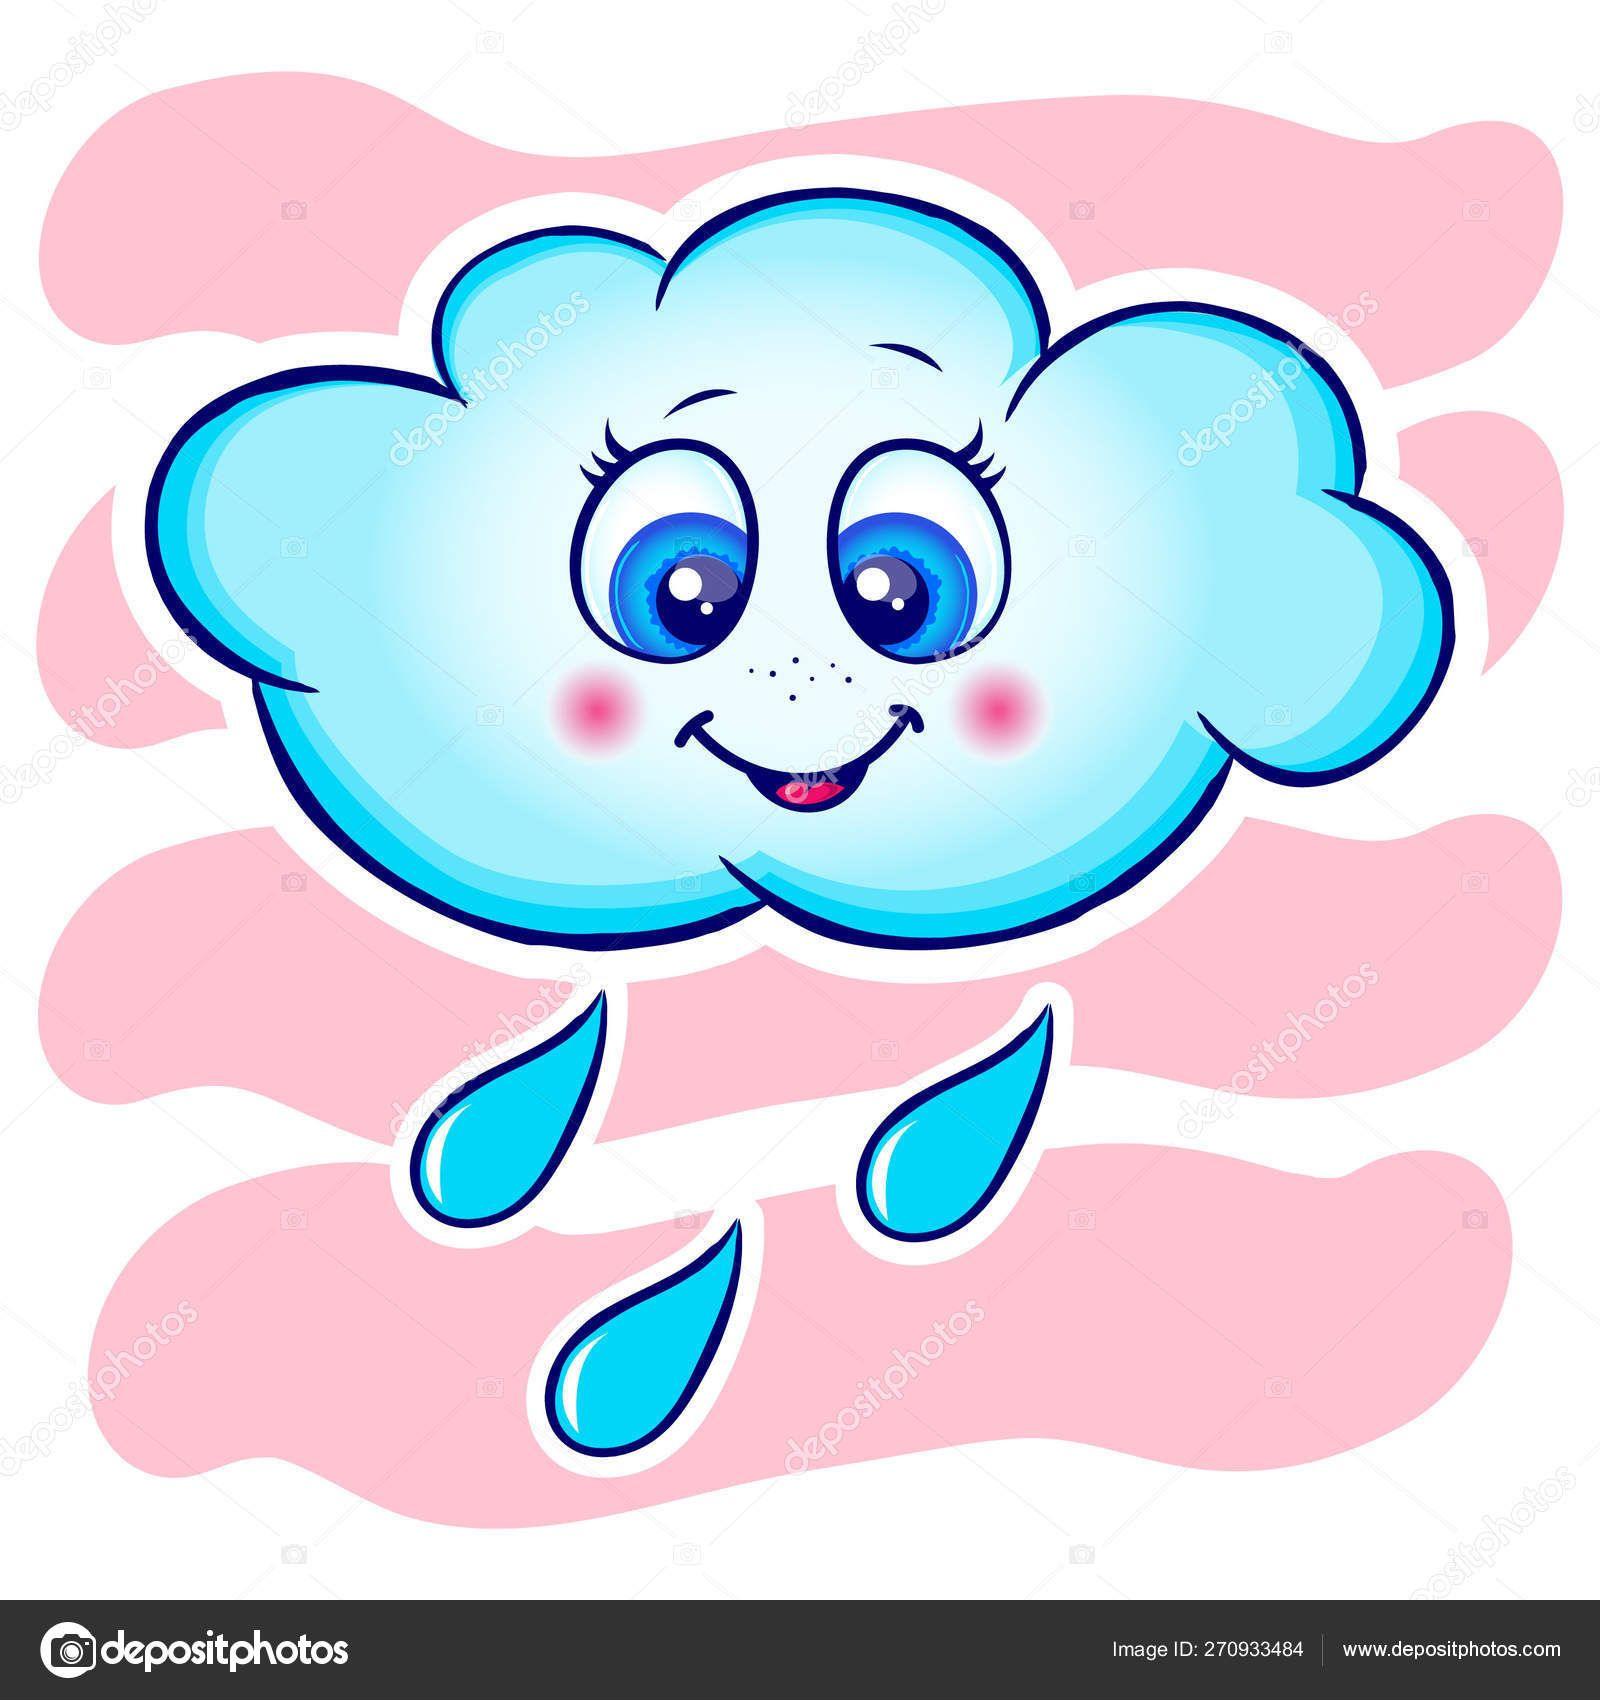 CloudColorWhiteBlueVectorDesignSpaceShapeSky